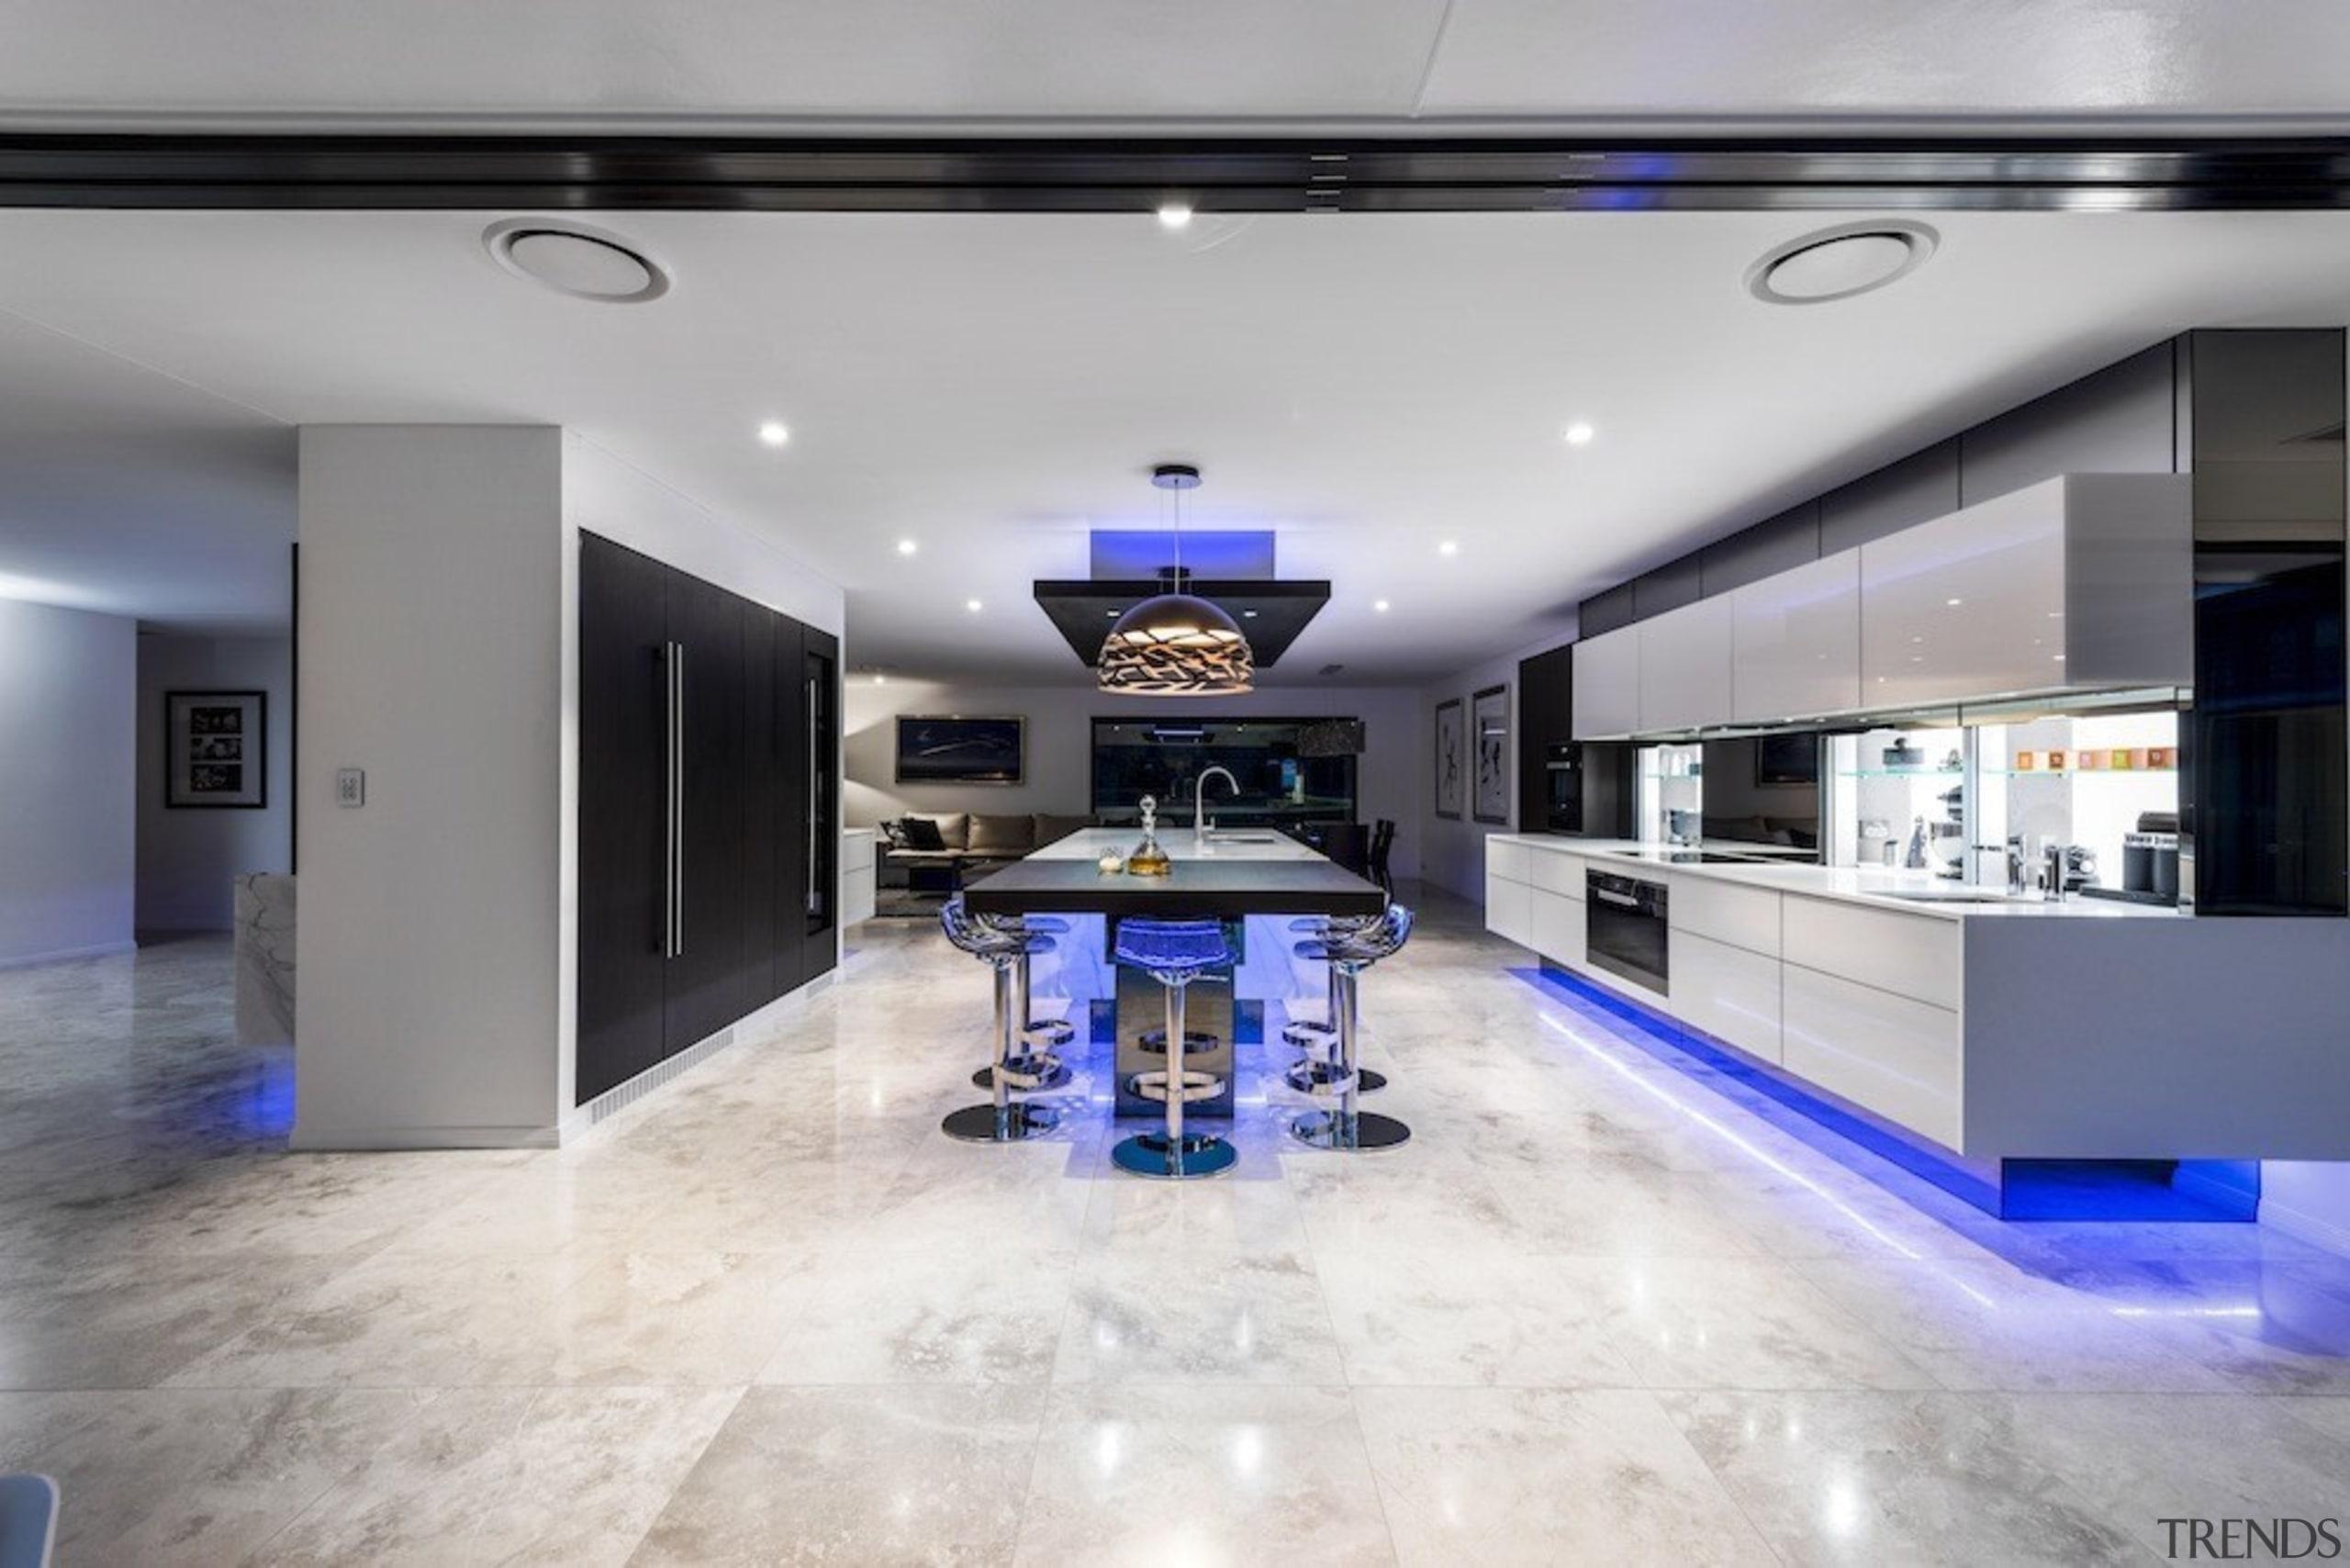 A focus on lighting – Kitchen by designer ceiling, floor, interior design, living room, lobby, property, real estate, gray, white